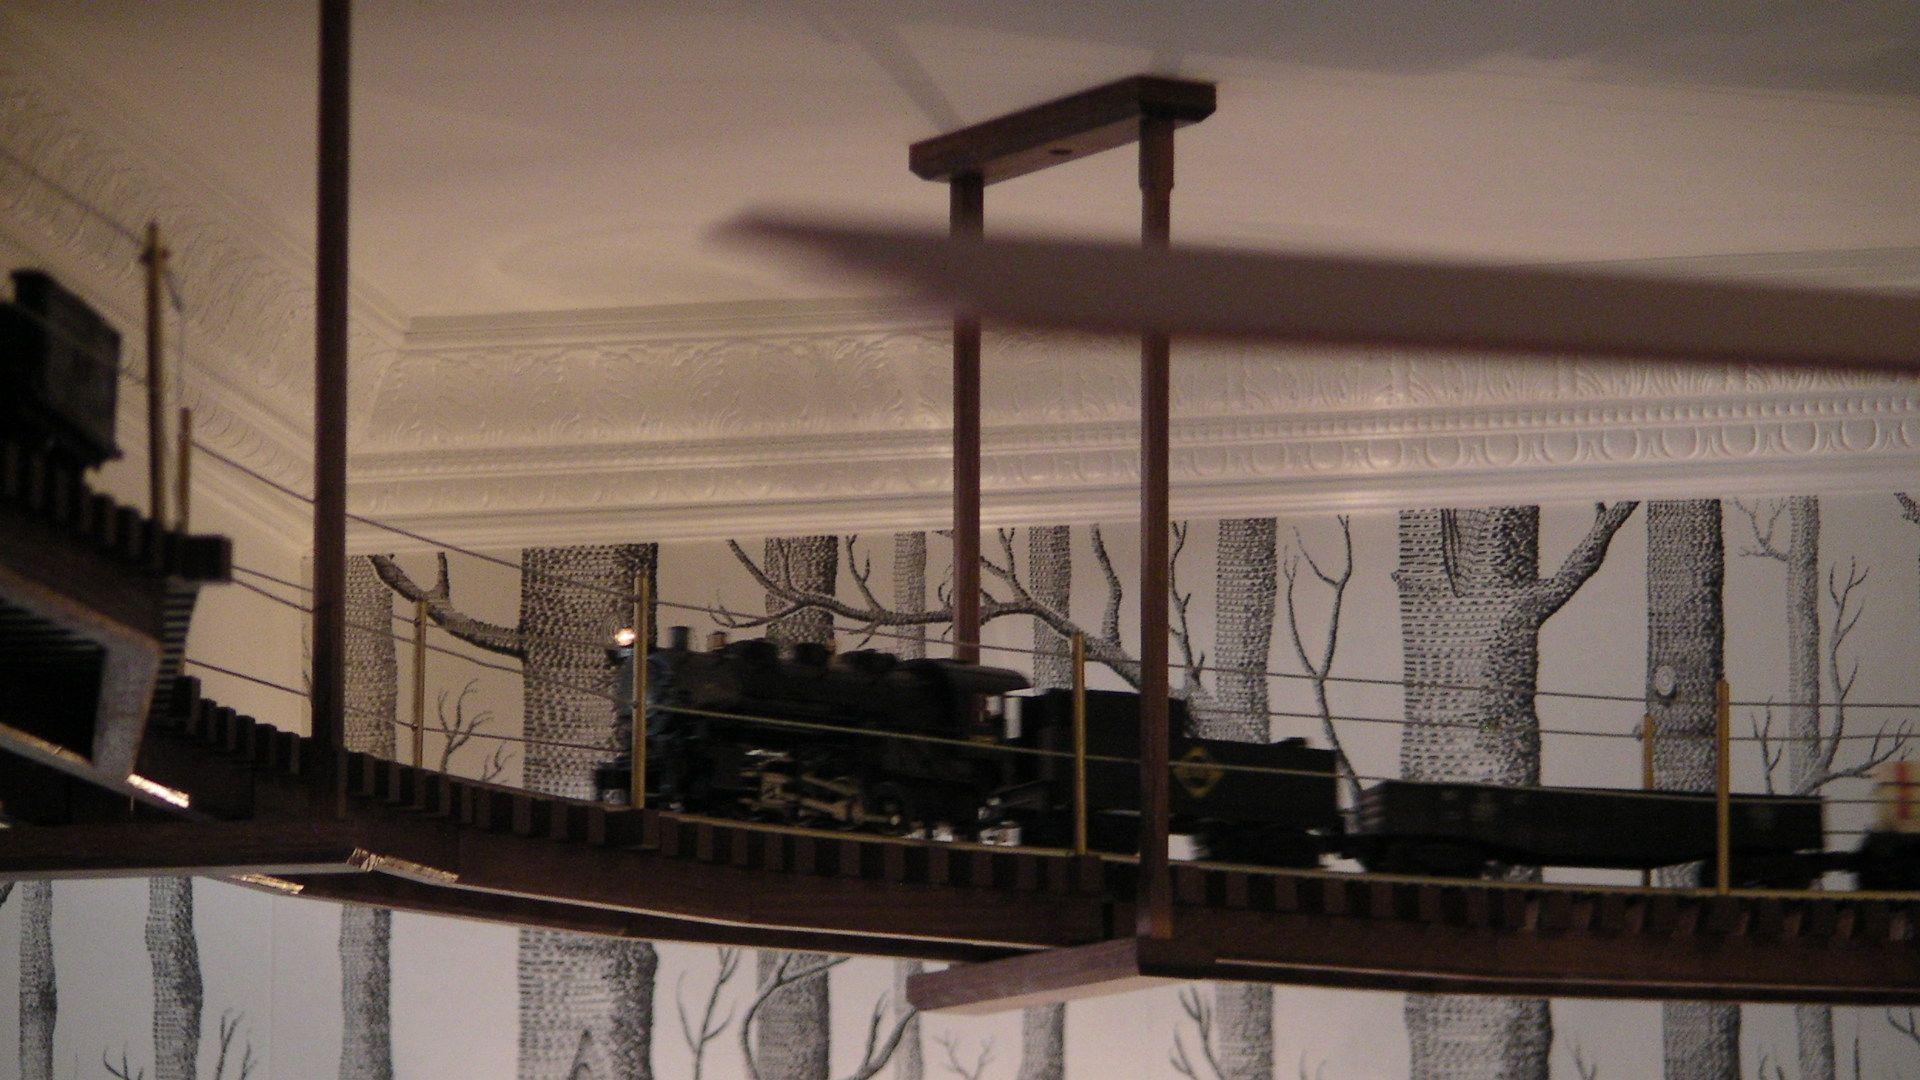 Lionel Train Chugs Around Ceiling Of